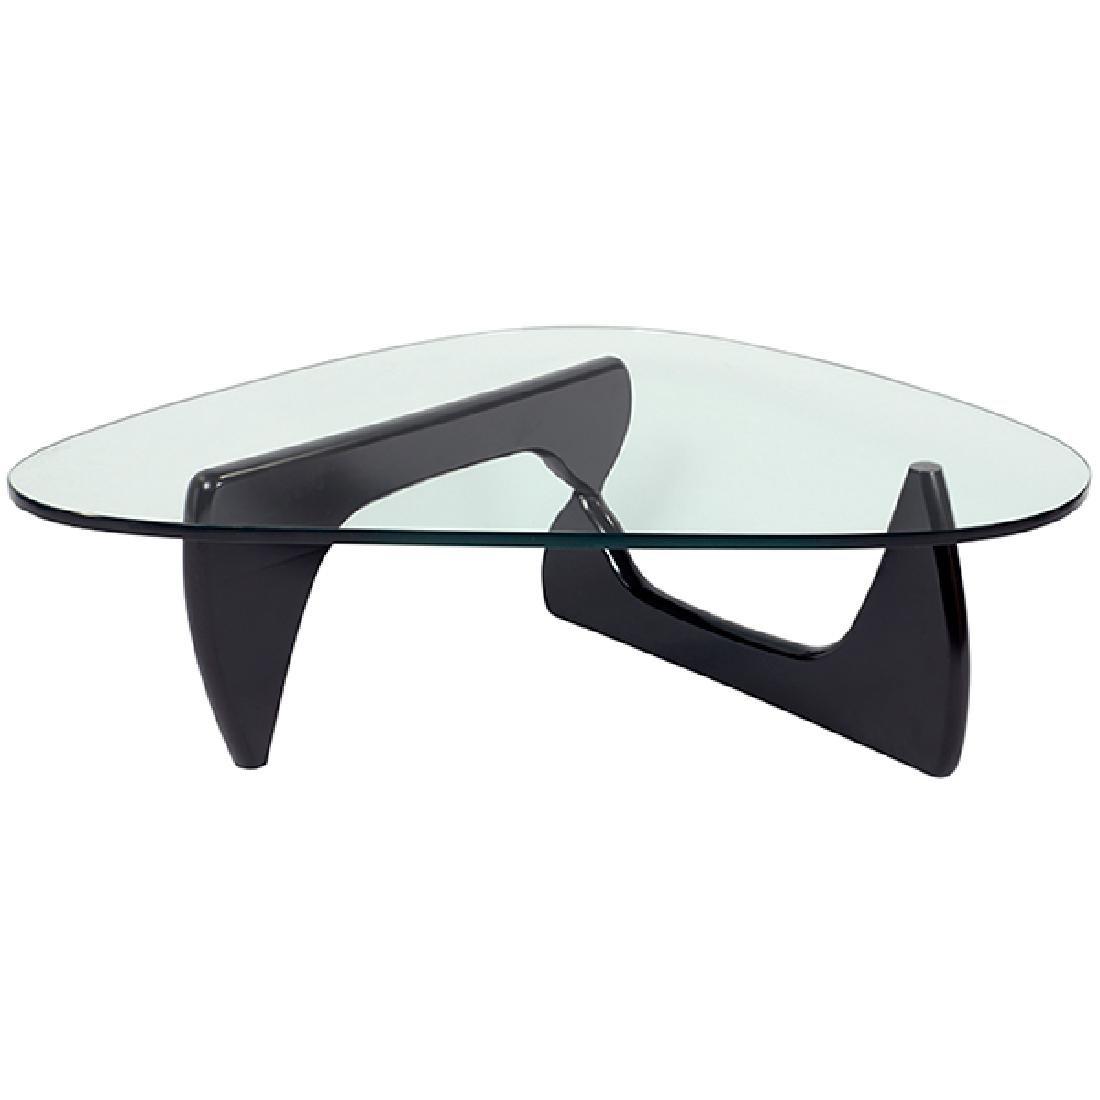 Isamu Noguchi (American, 1904-1988) IN-50 coffee table